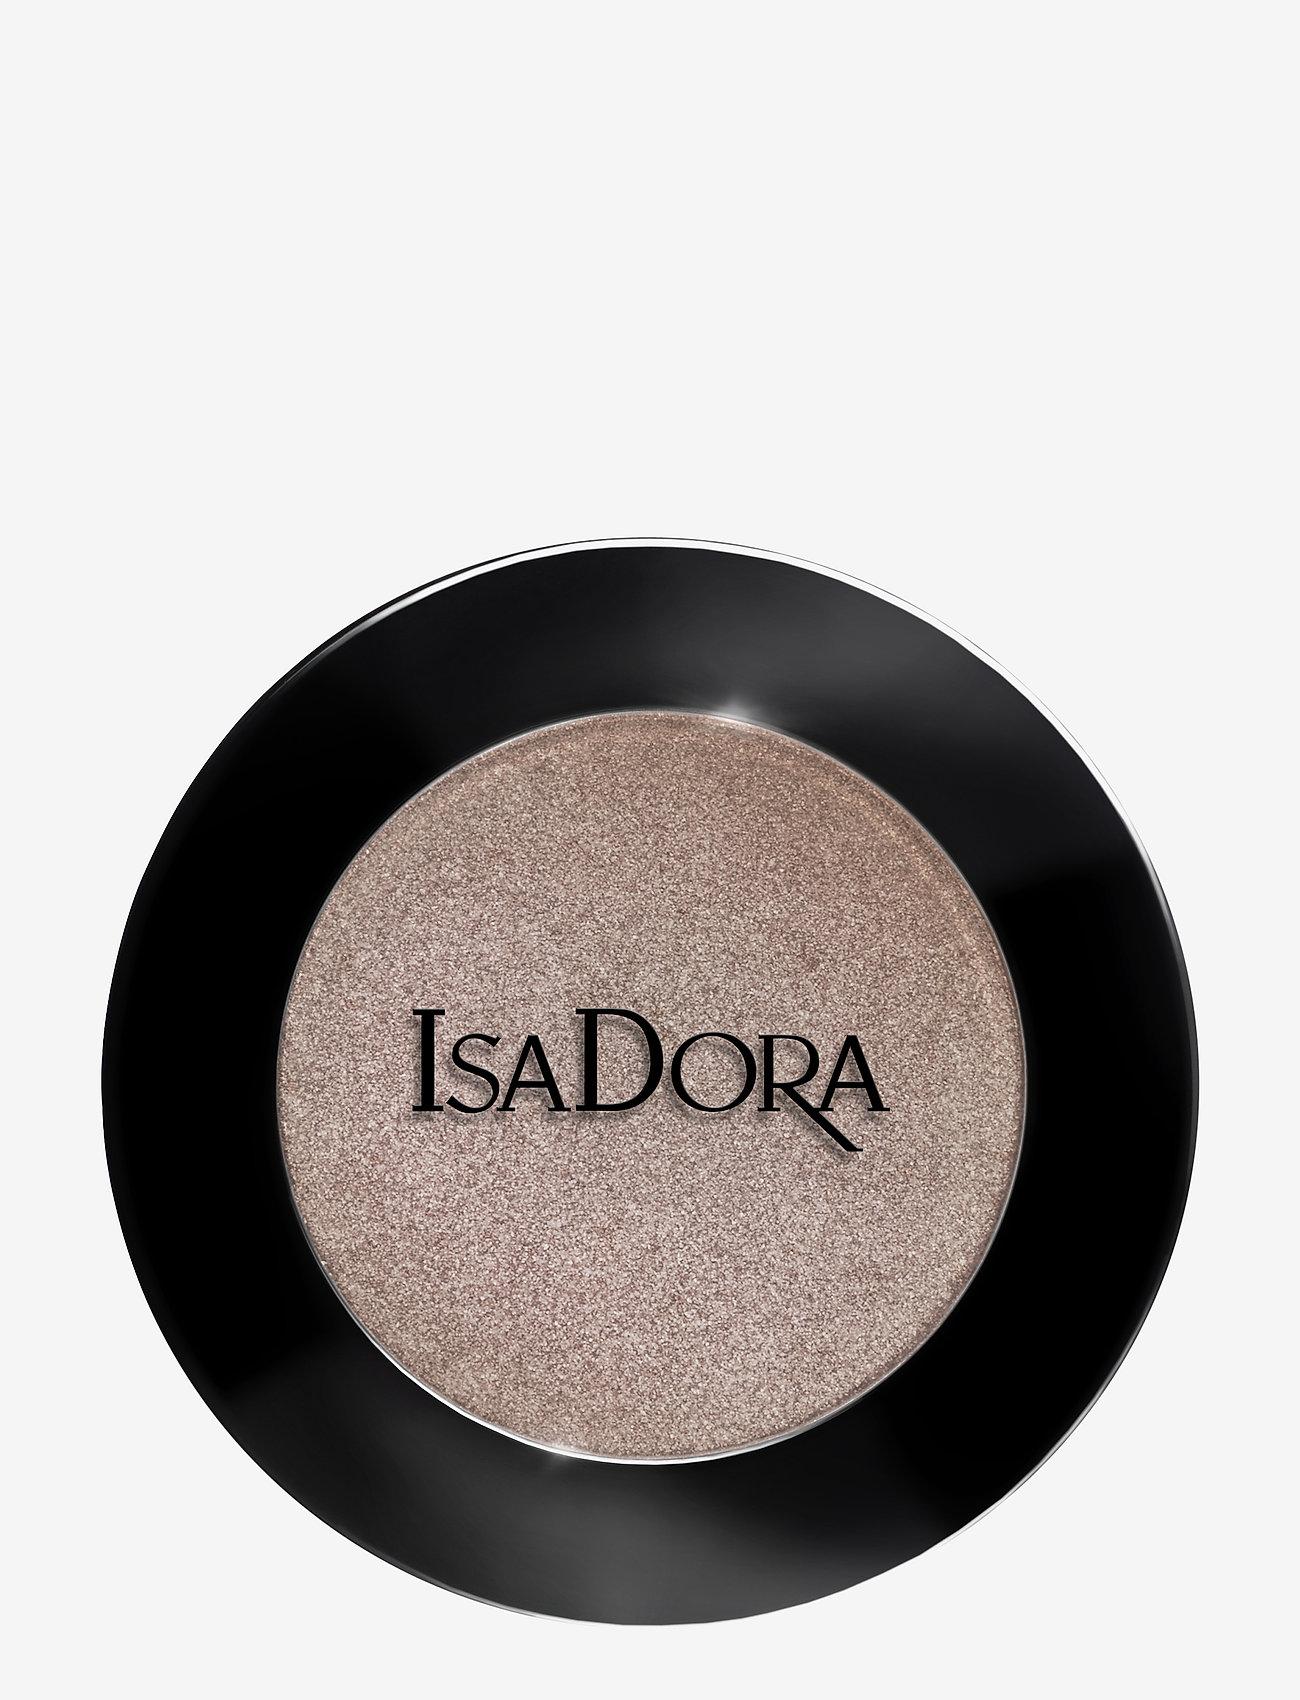 Isadora - PERFECT EYES - Ögonskugga - 326 cashmere - 0